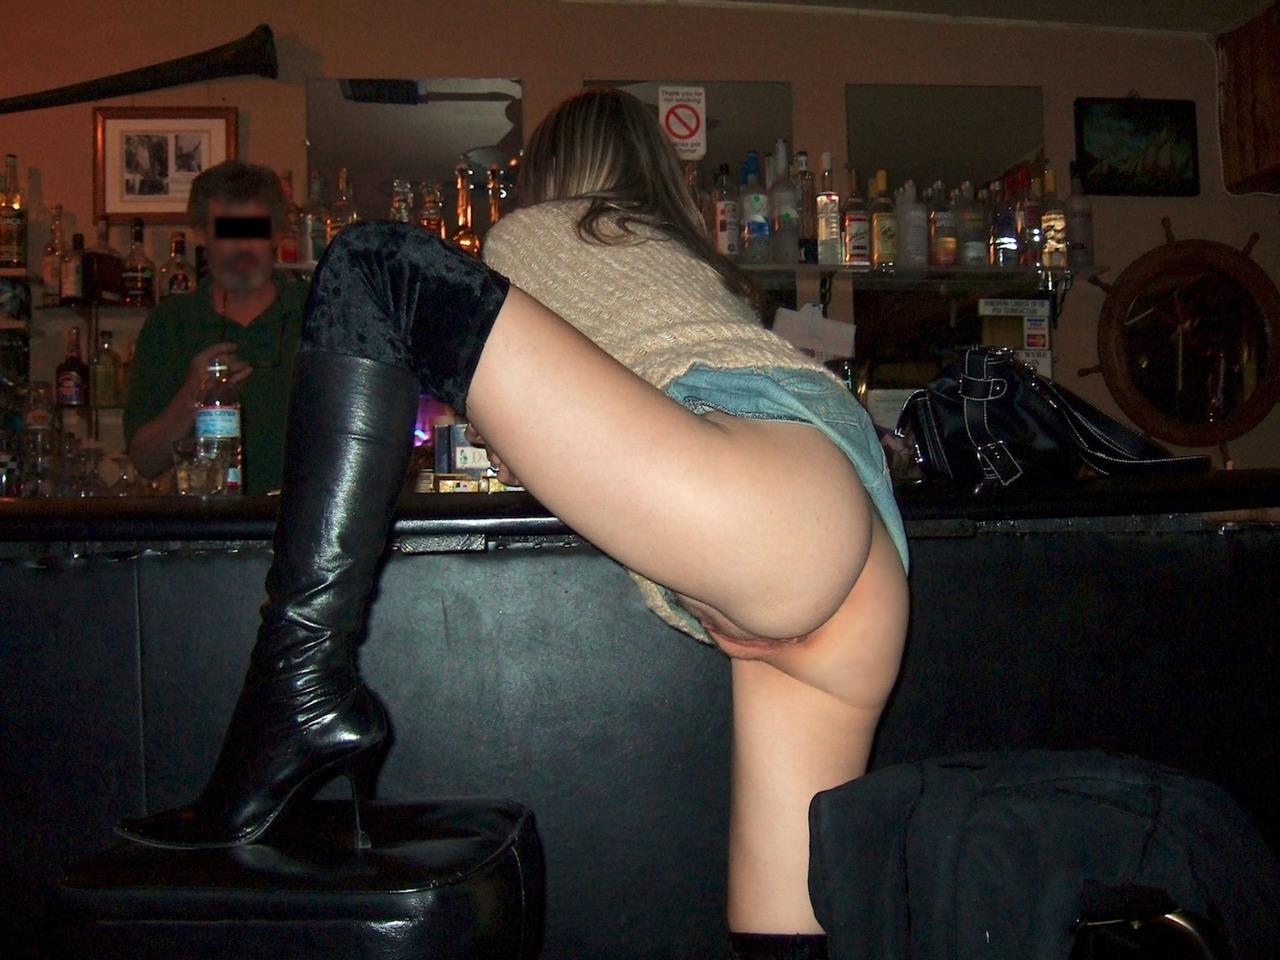 Very Hot girls dressed slutty in public